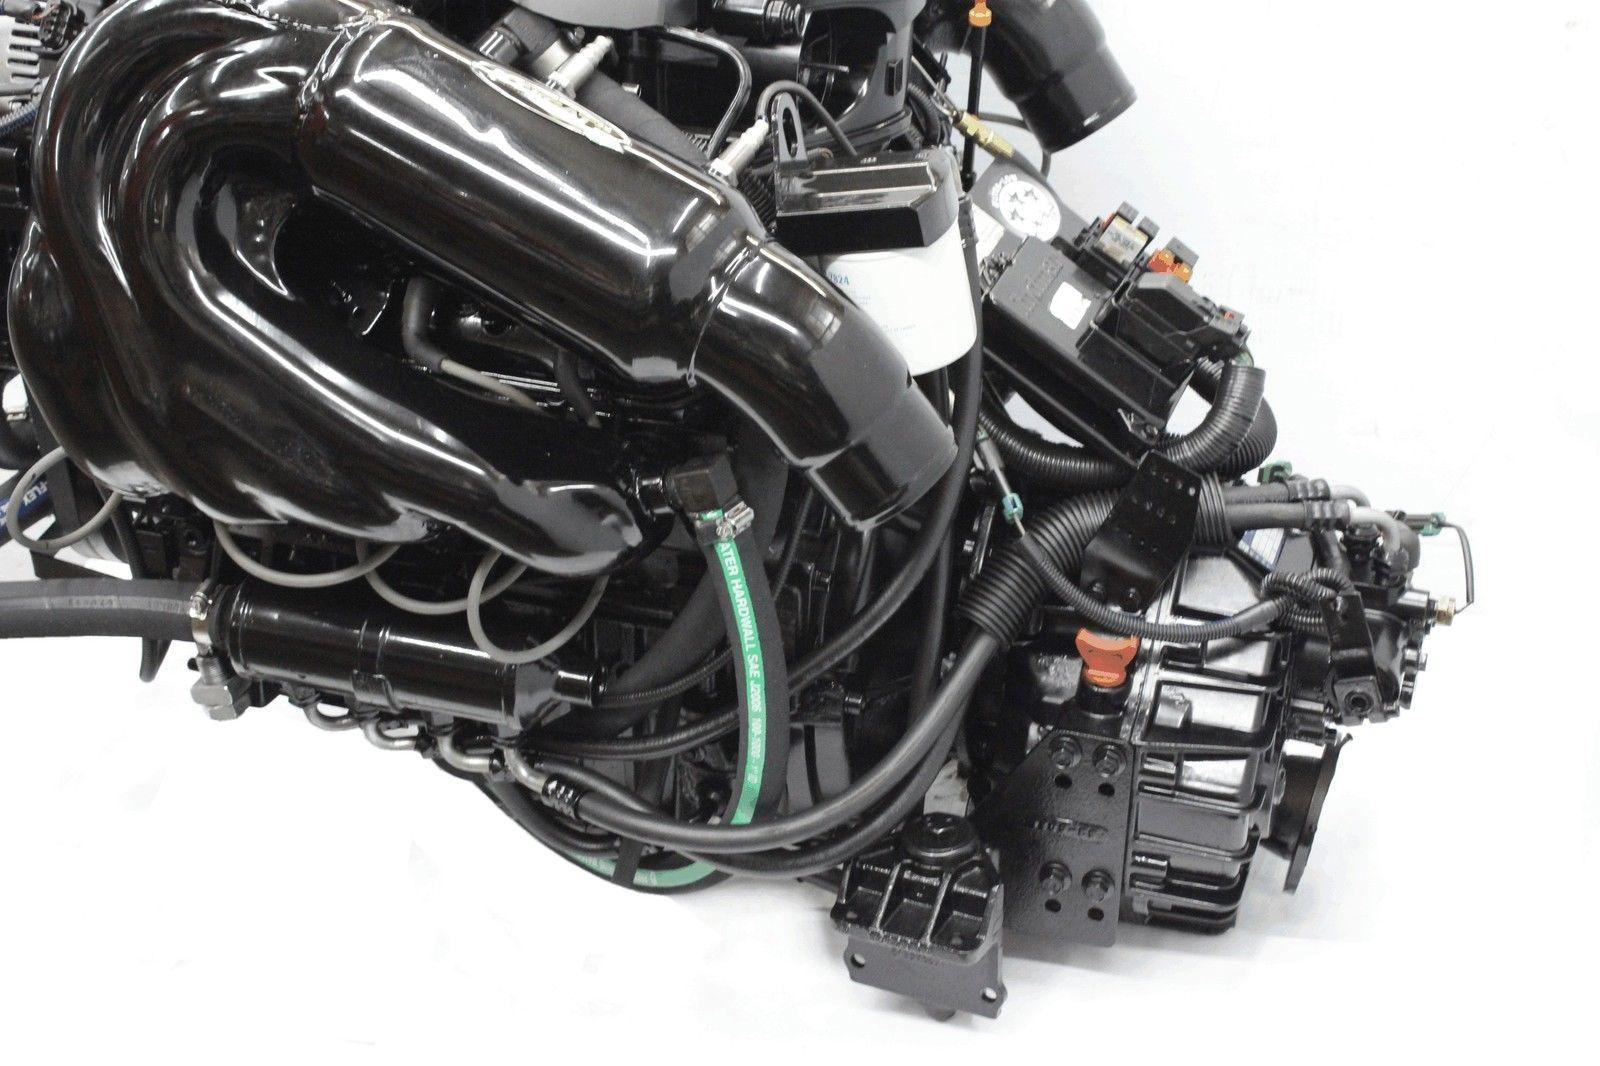 indmar maintenance manual rh indmar maintenance manual esoulk de Indmar Marine Engine Service Manual Indmar Engine Parts